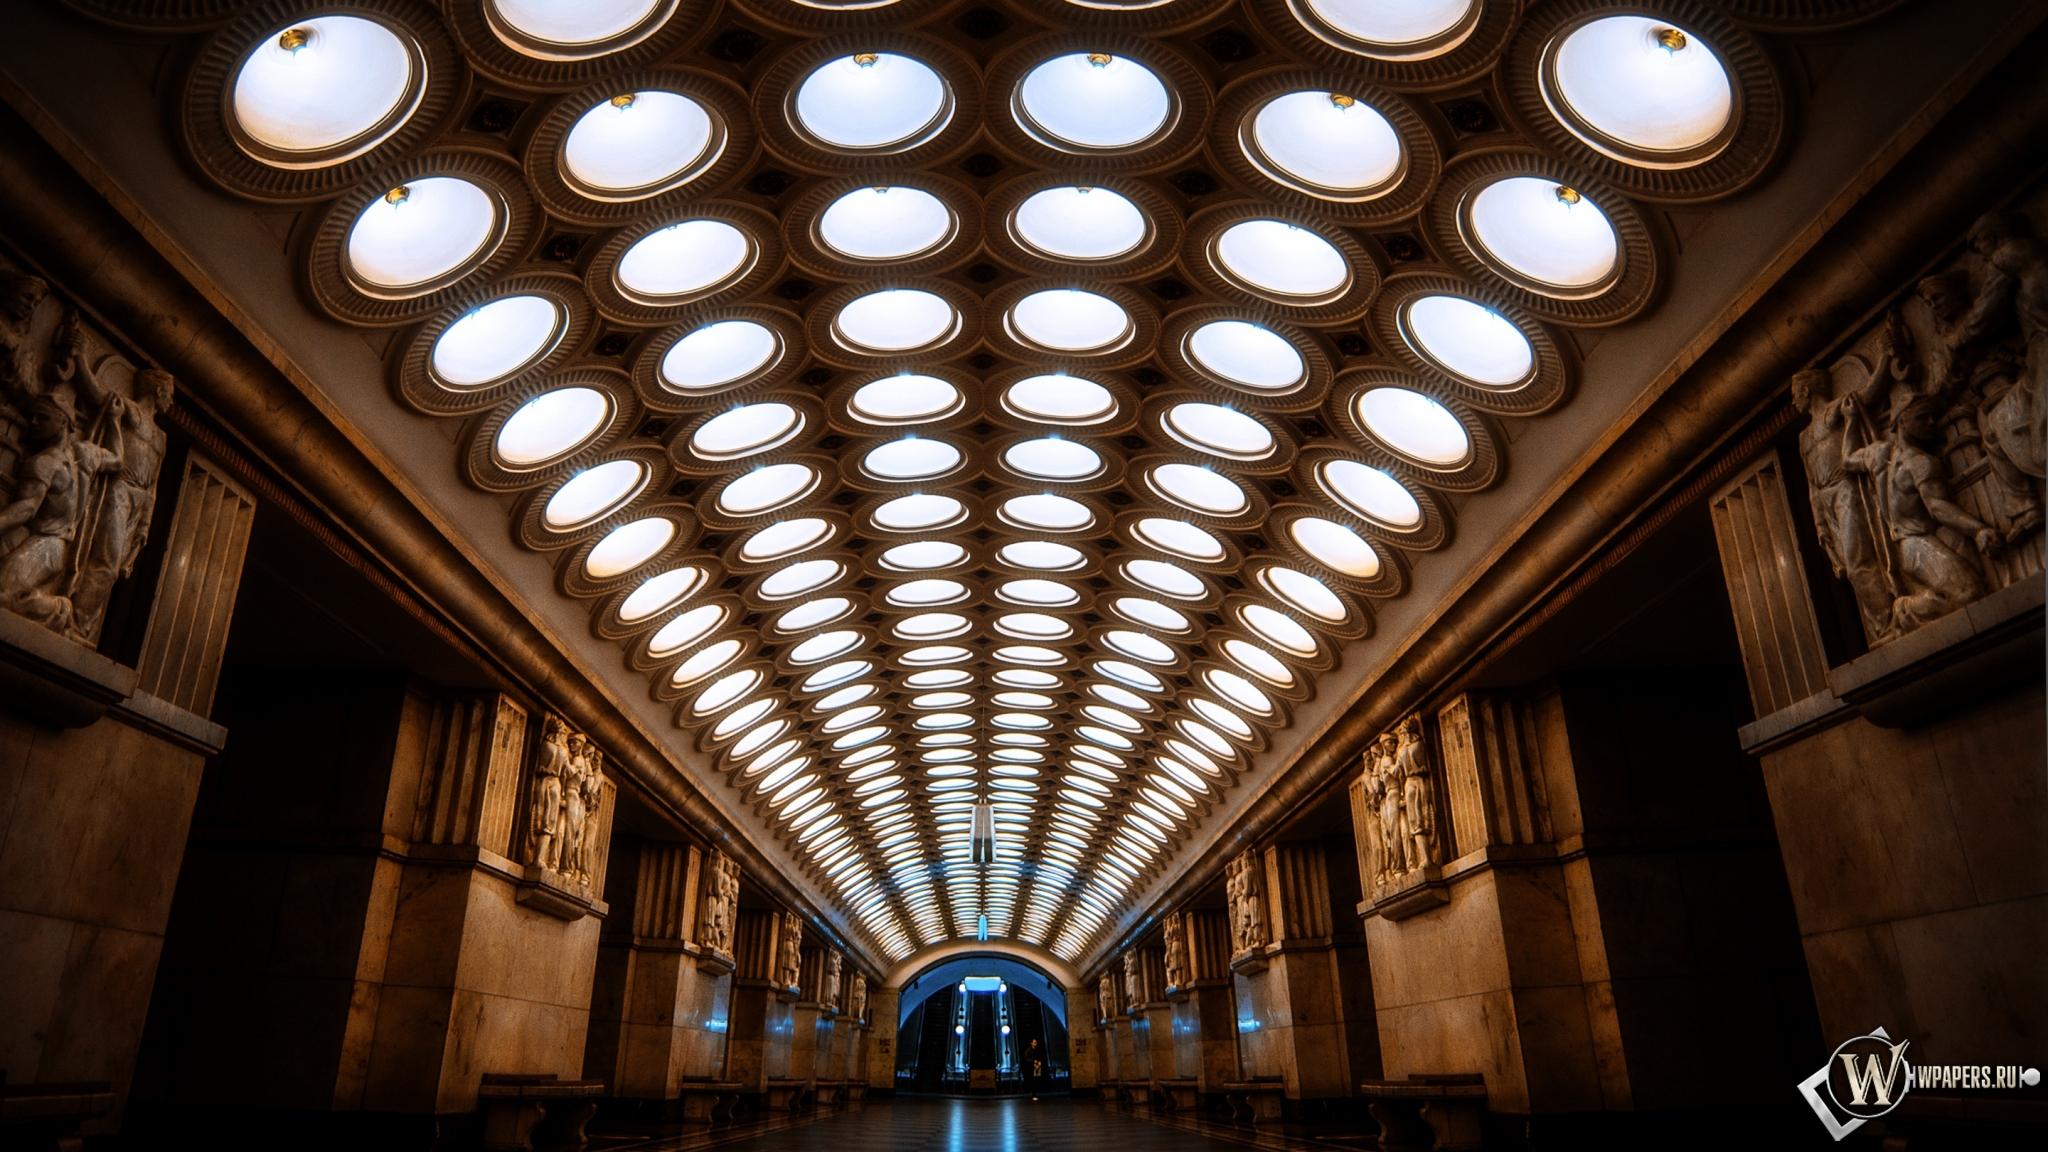 Москва метро 2048x1152 картинки